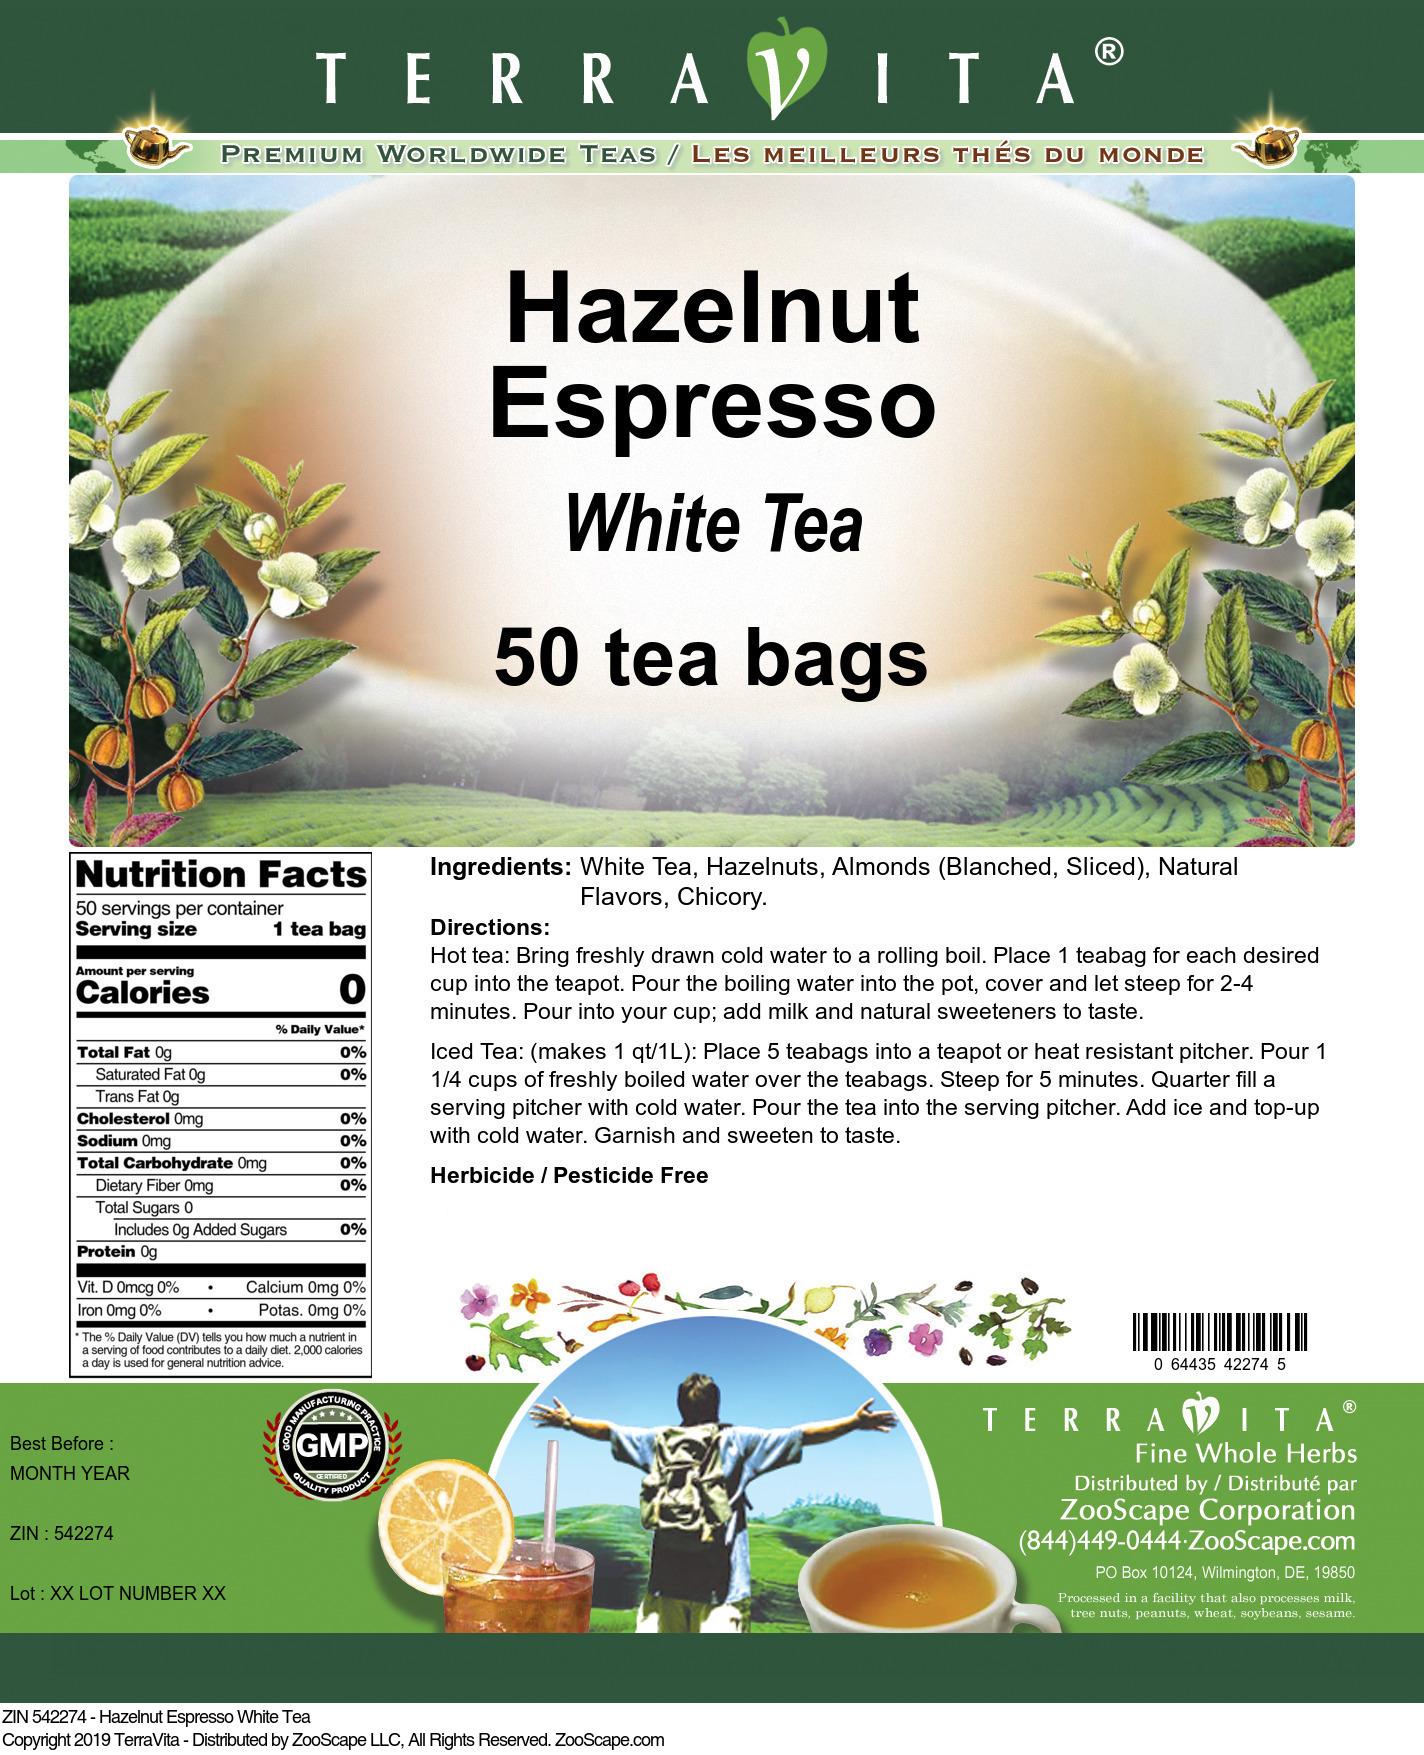 Hazelnut Espresso White Tea